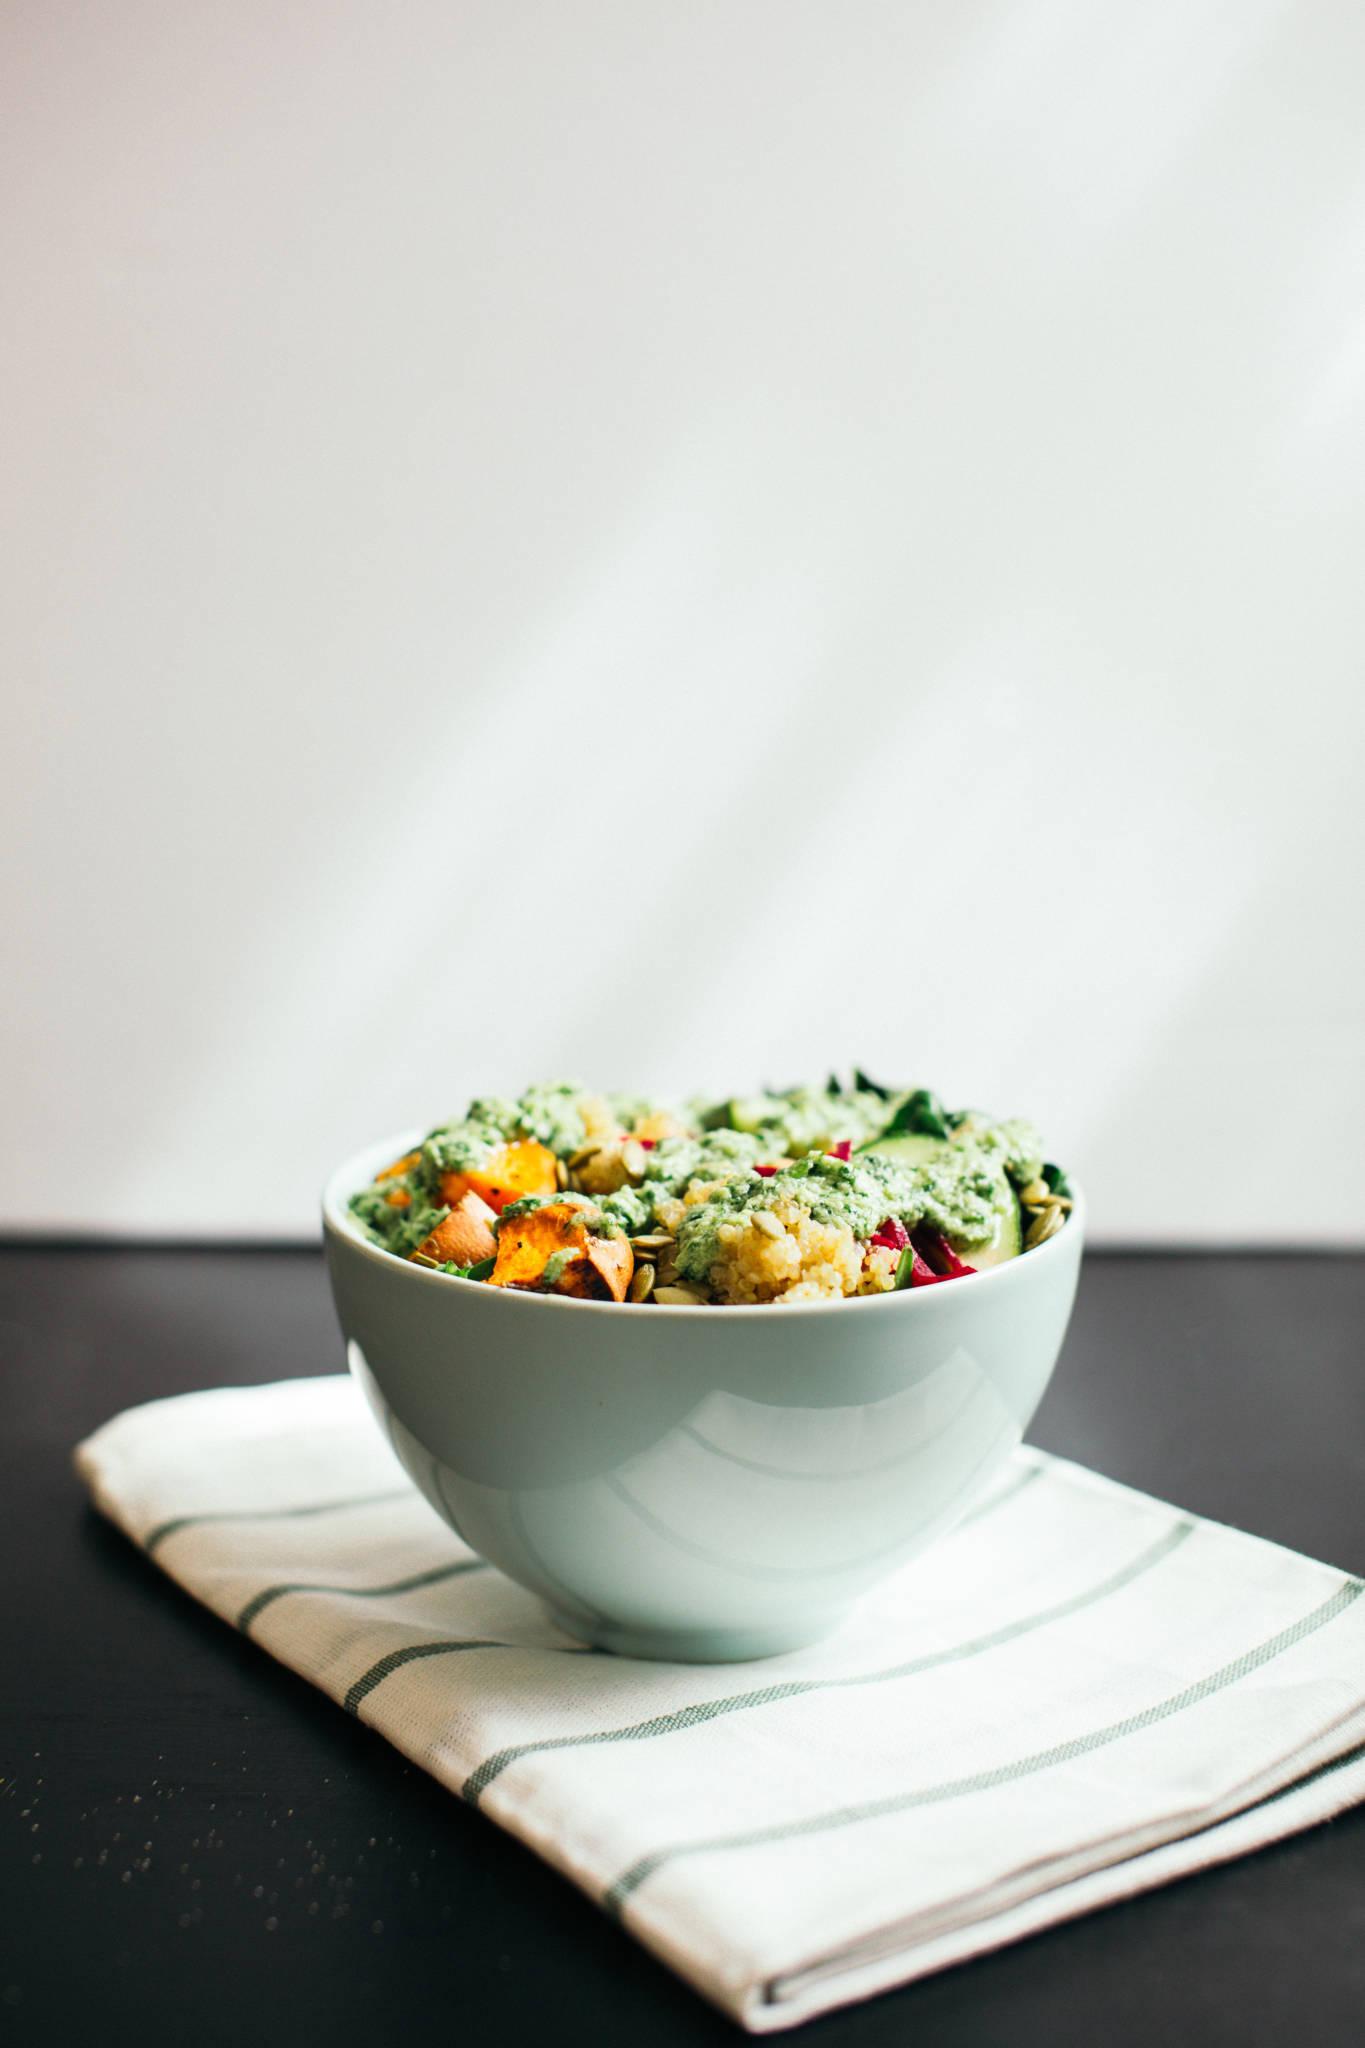 Spring Detox Quinoa Salad Recipe - Vegetarian